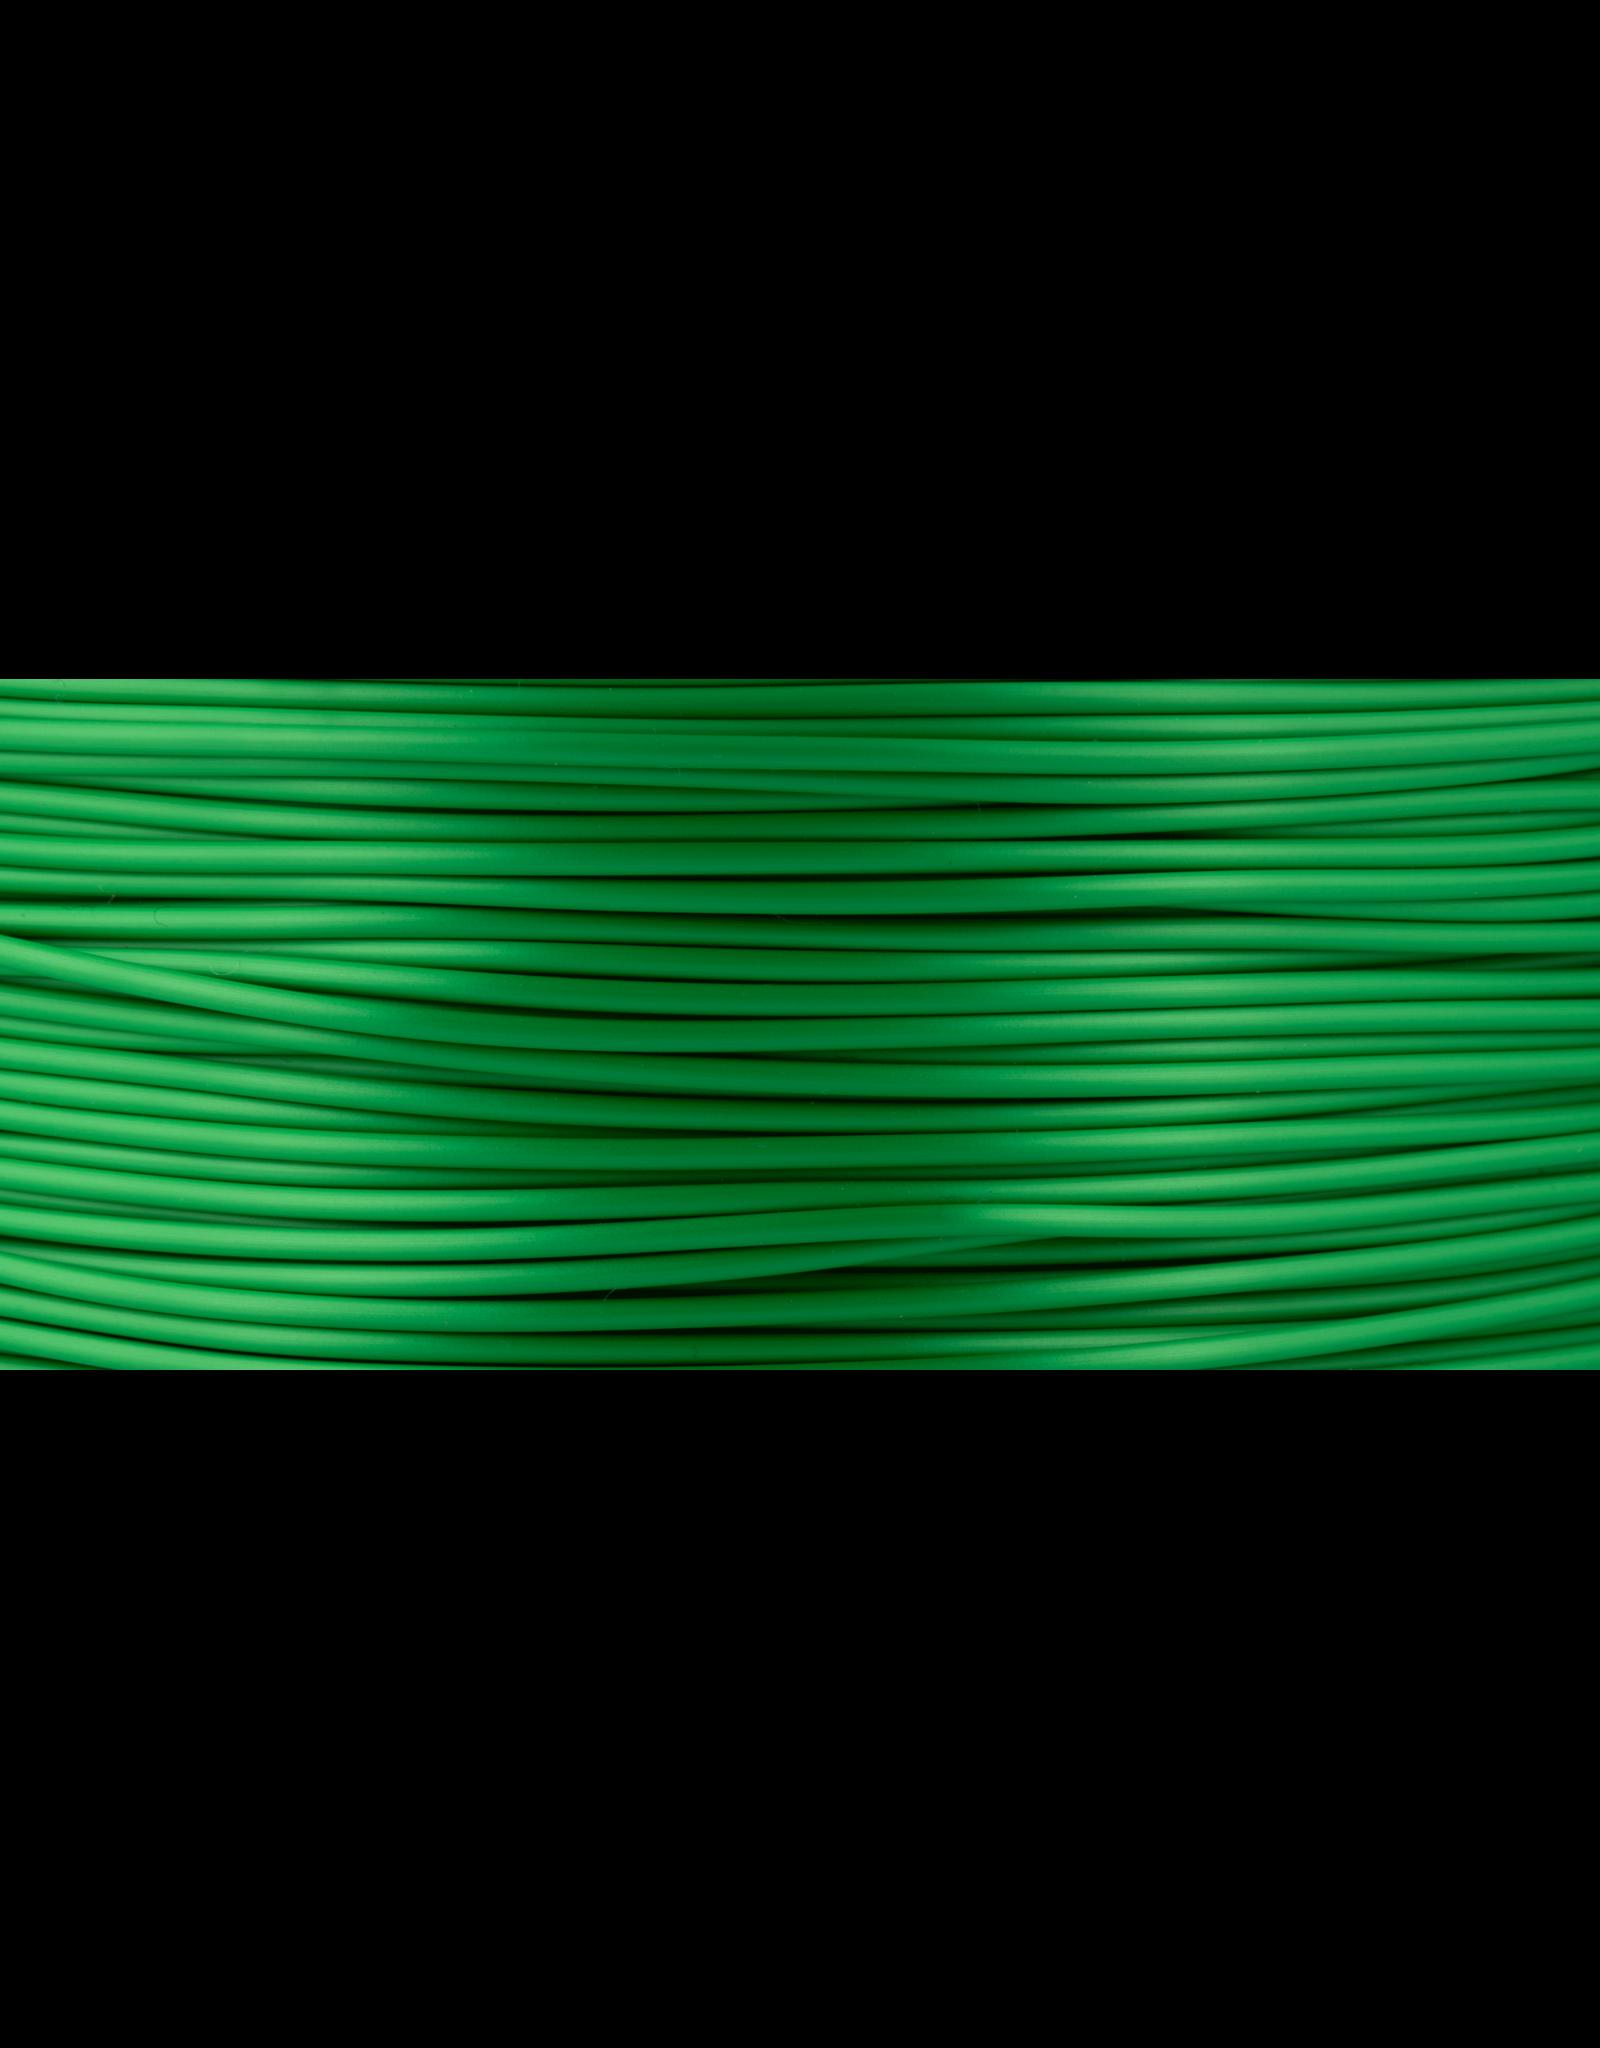 Prima PrimaSelect PLA Glossy - 1.75mm - 750 g  - Jungle groen